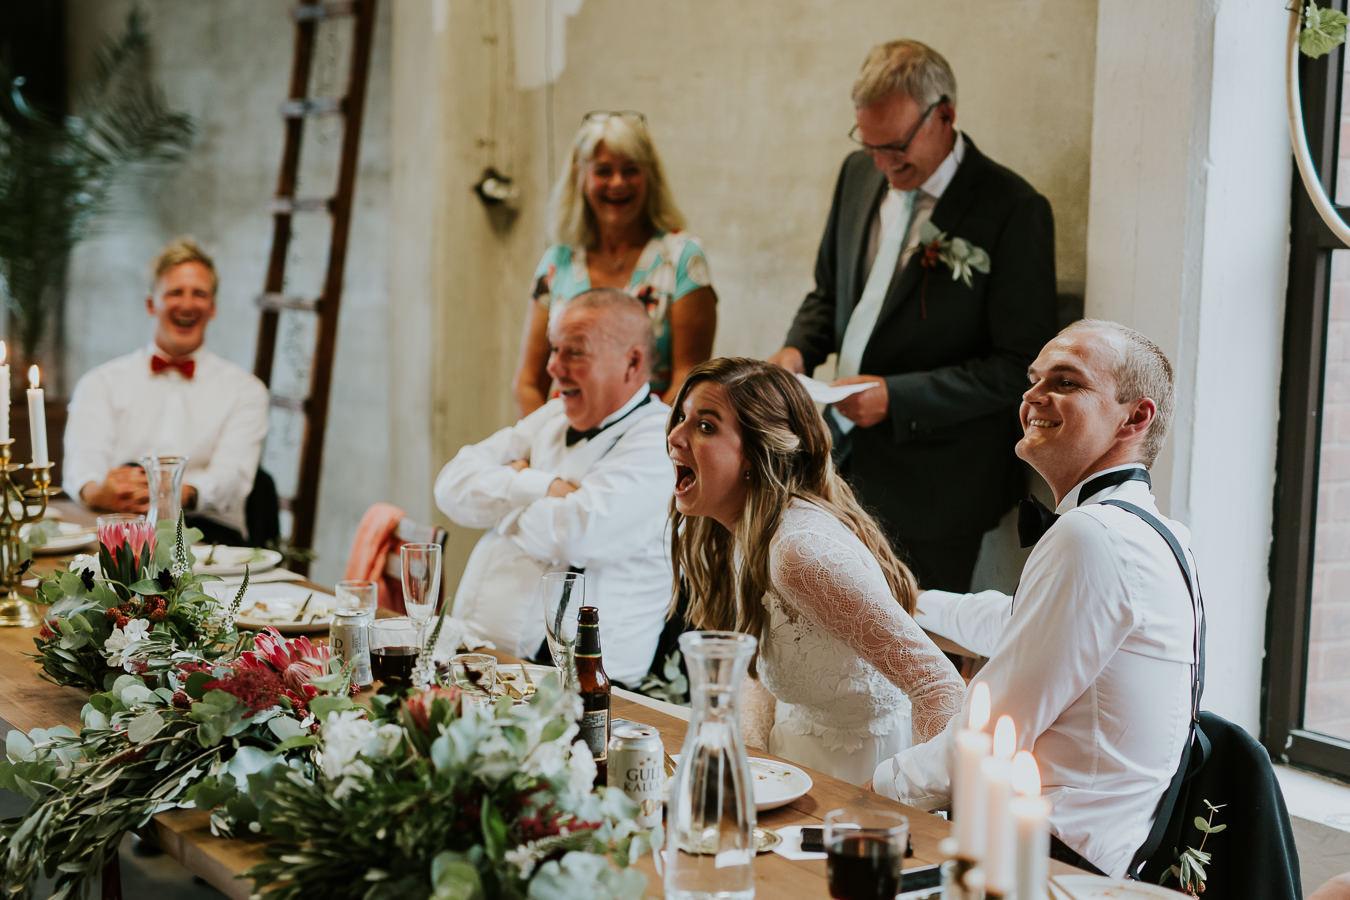 Bryllup-Lageret-Tofte-bryllupsfotograf-175.jpg